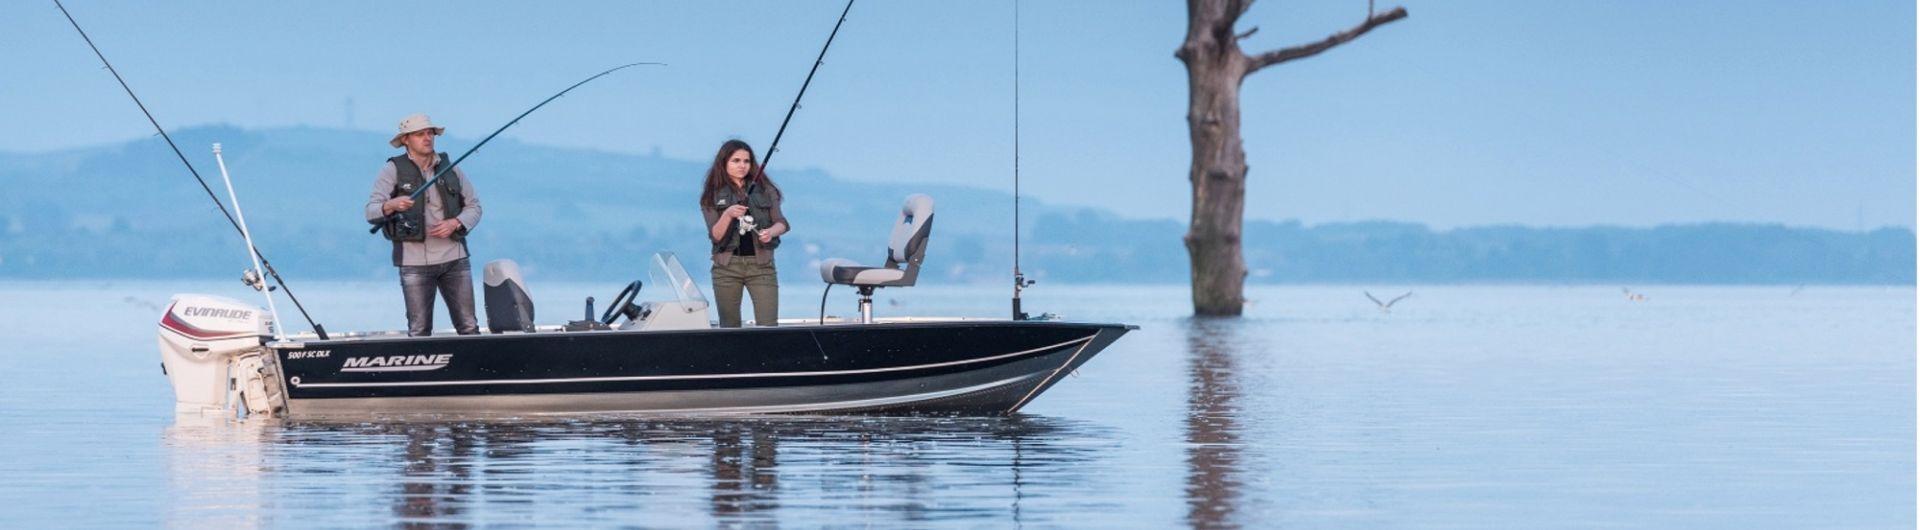 Aluboot-Marine-Delux-Fishing-Serie